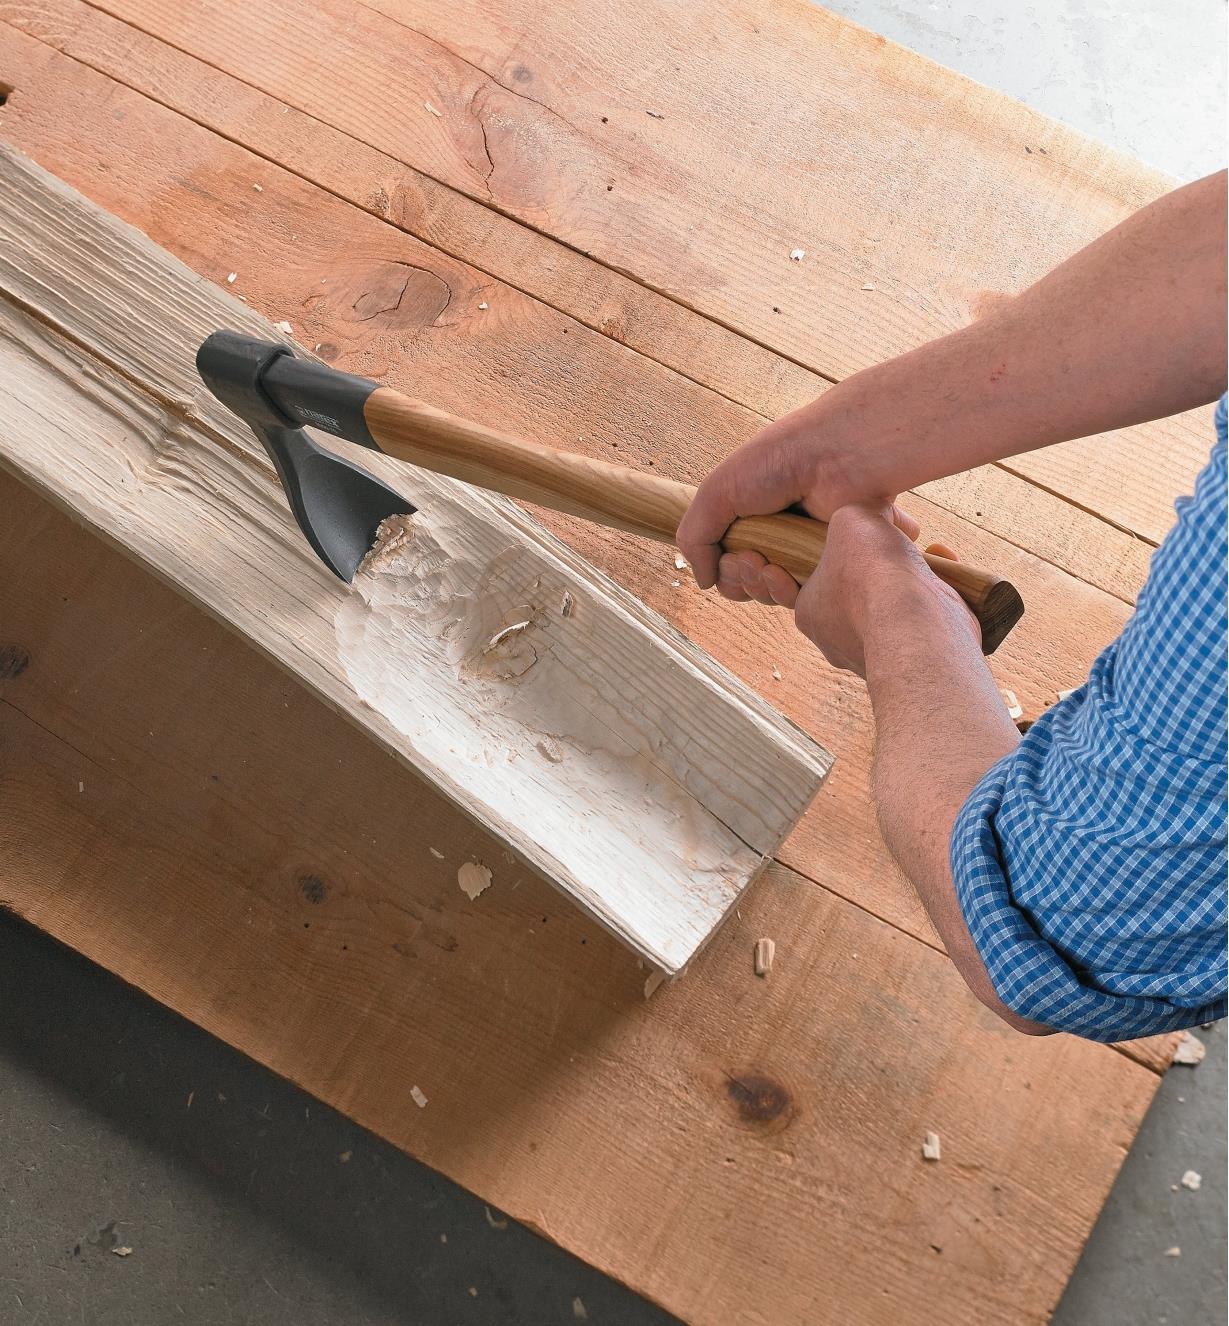 Hollowing half a log with a gutter adze